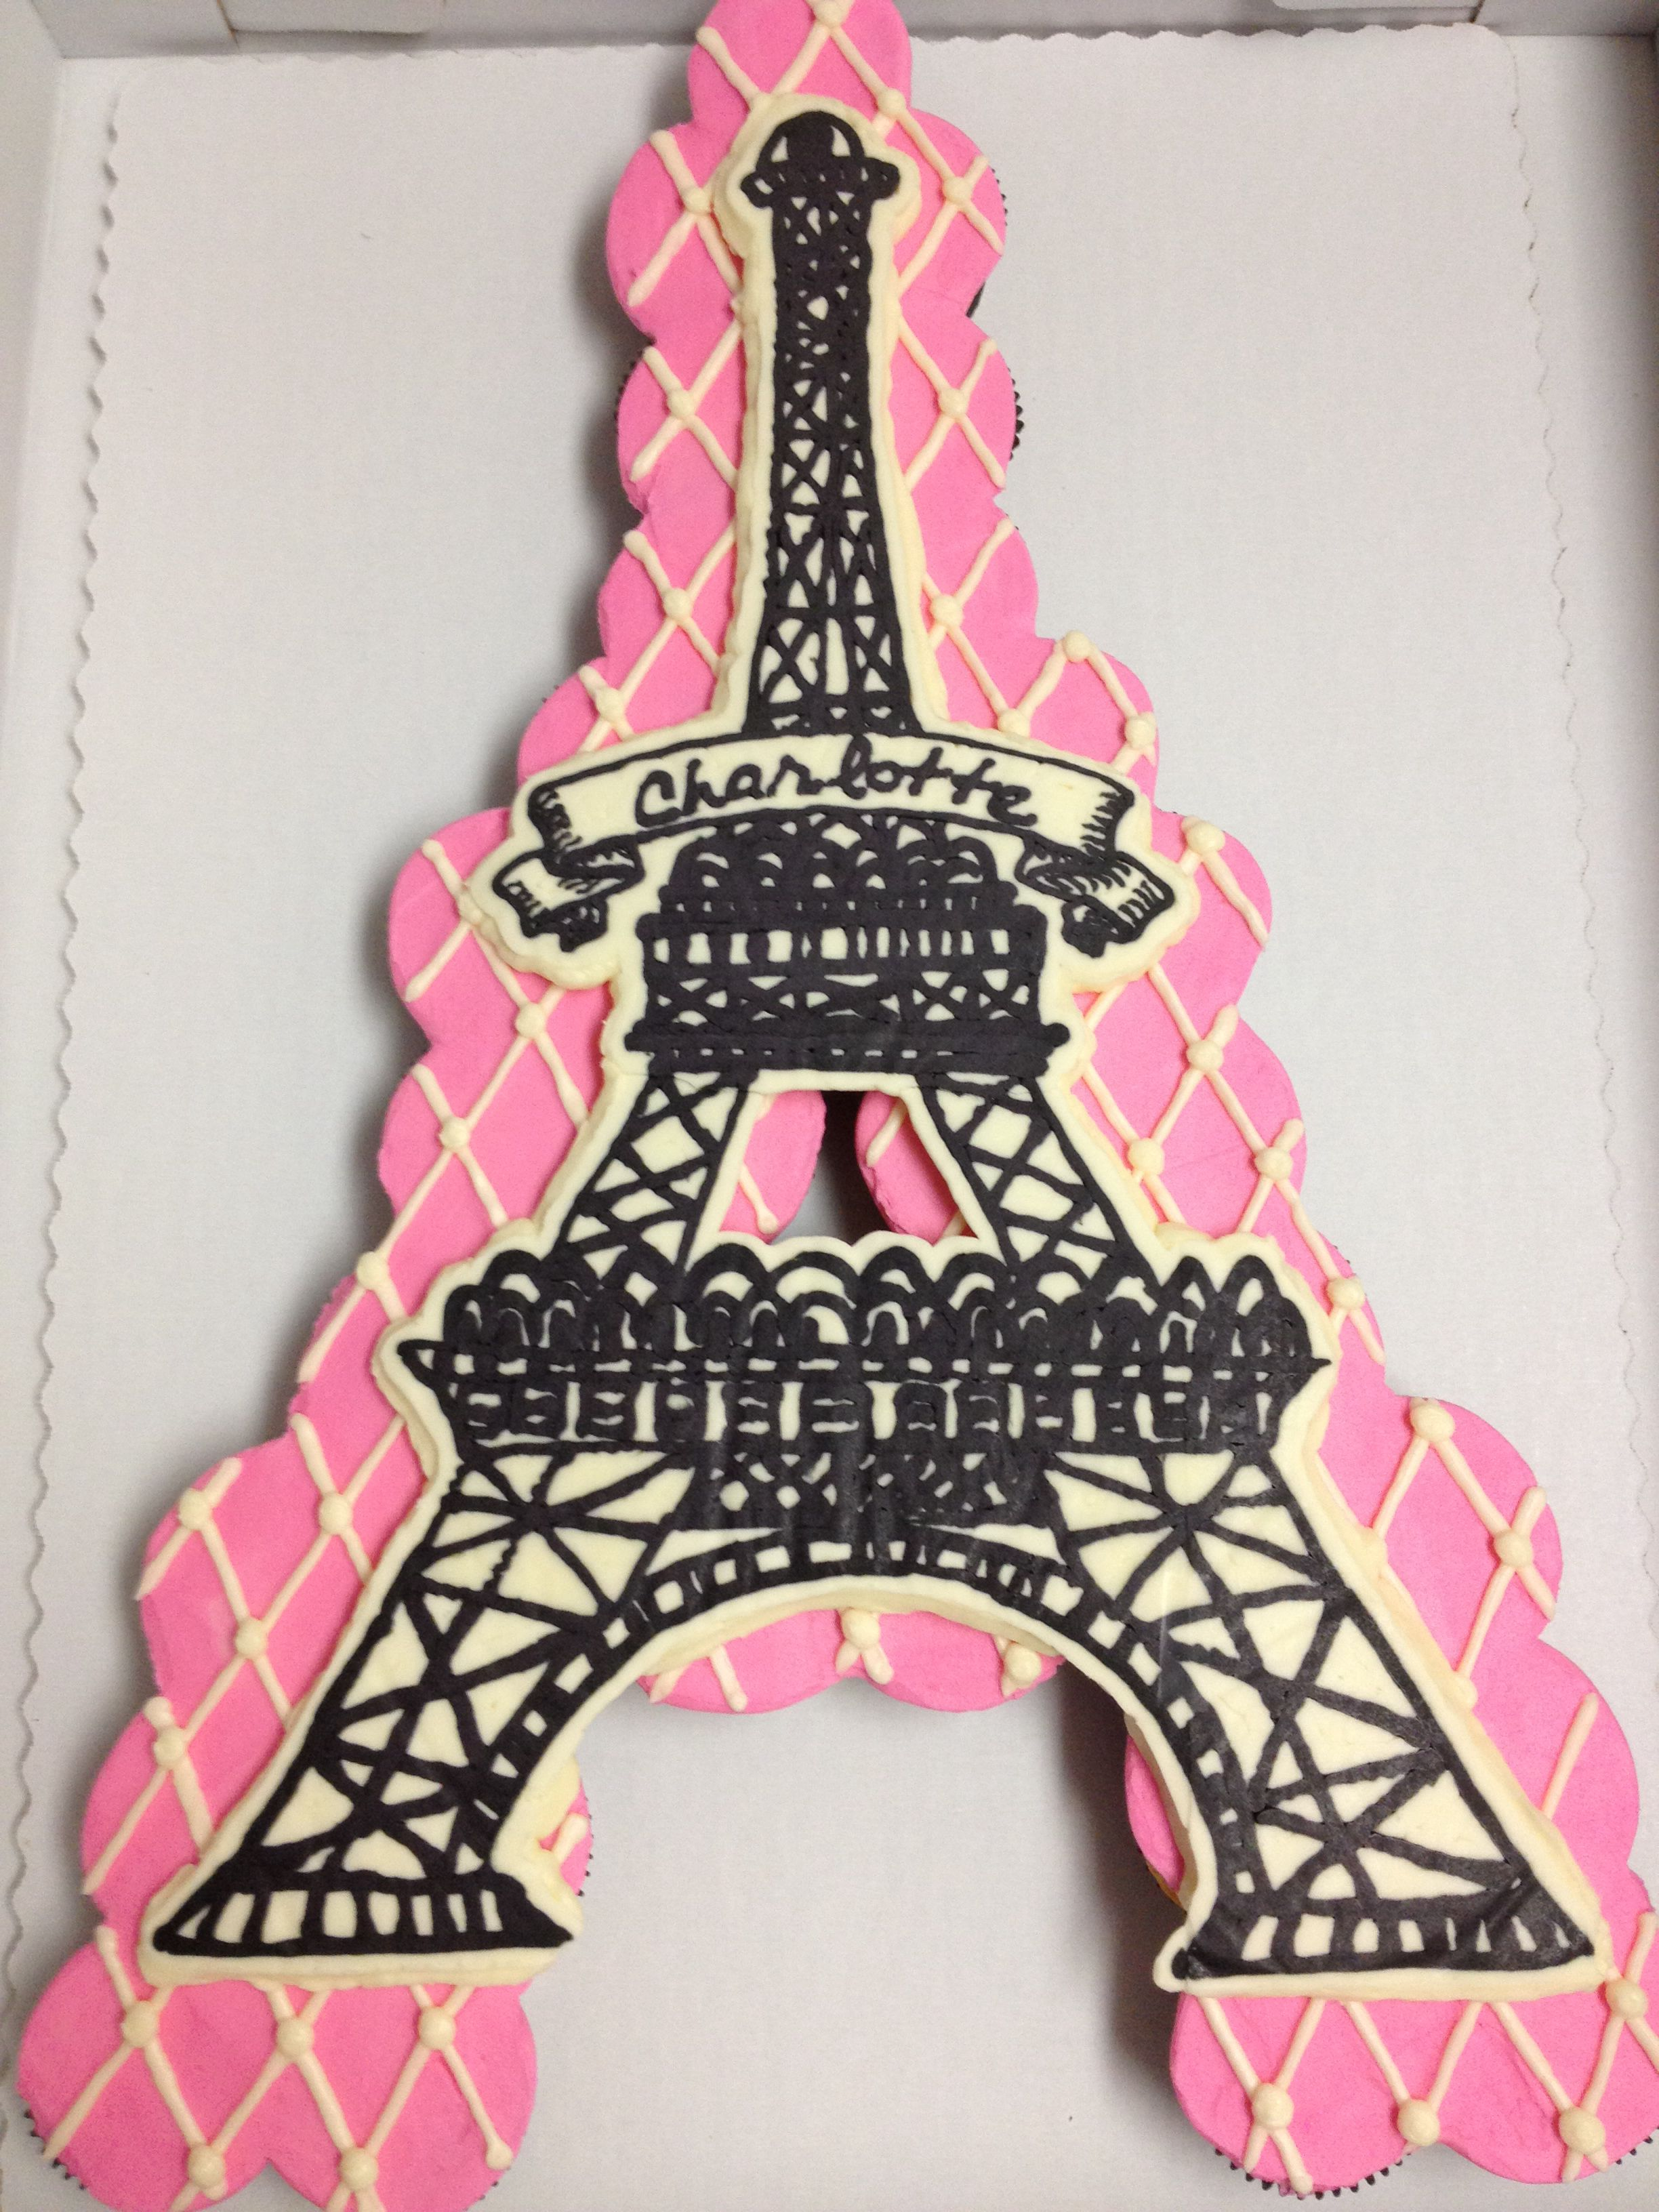 Sensational Eiffel Tower Cake With Images Eiffel Tower Cake Paris Personalised Birthday Cards Beptaeletsinfo